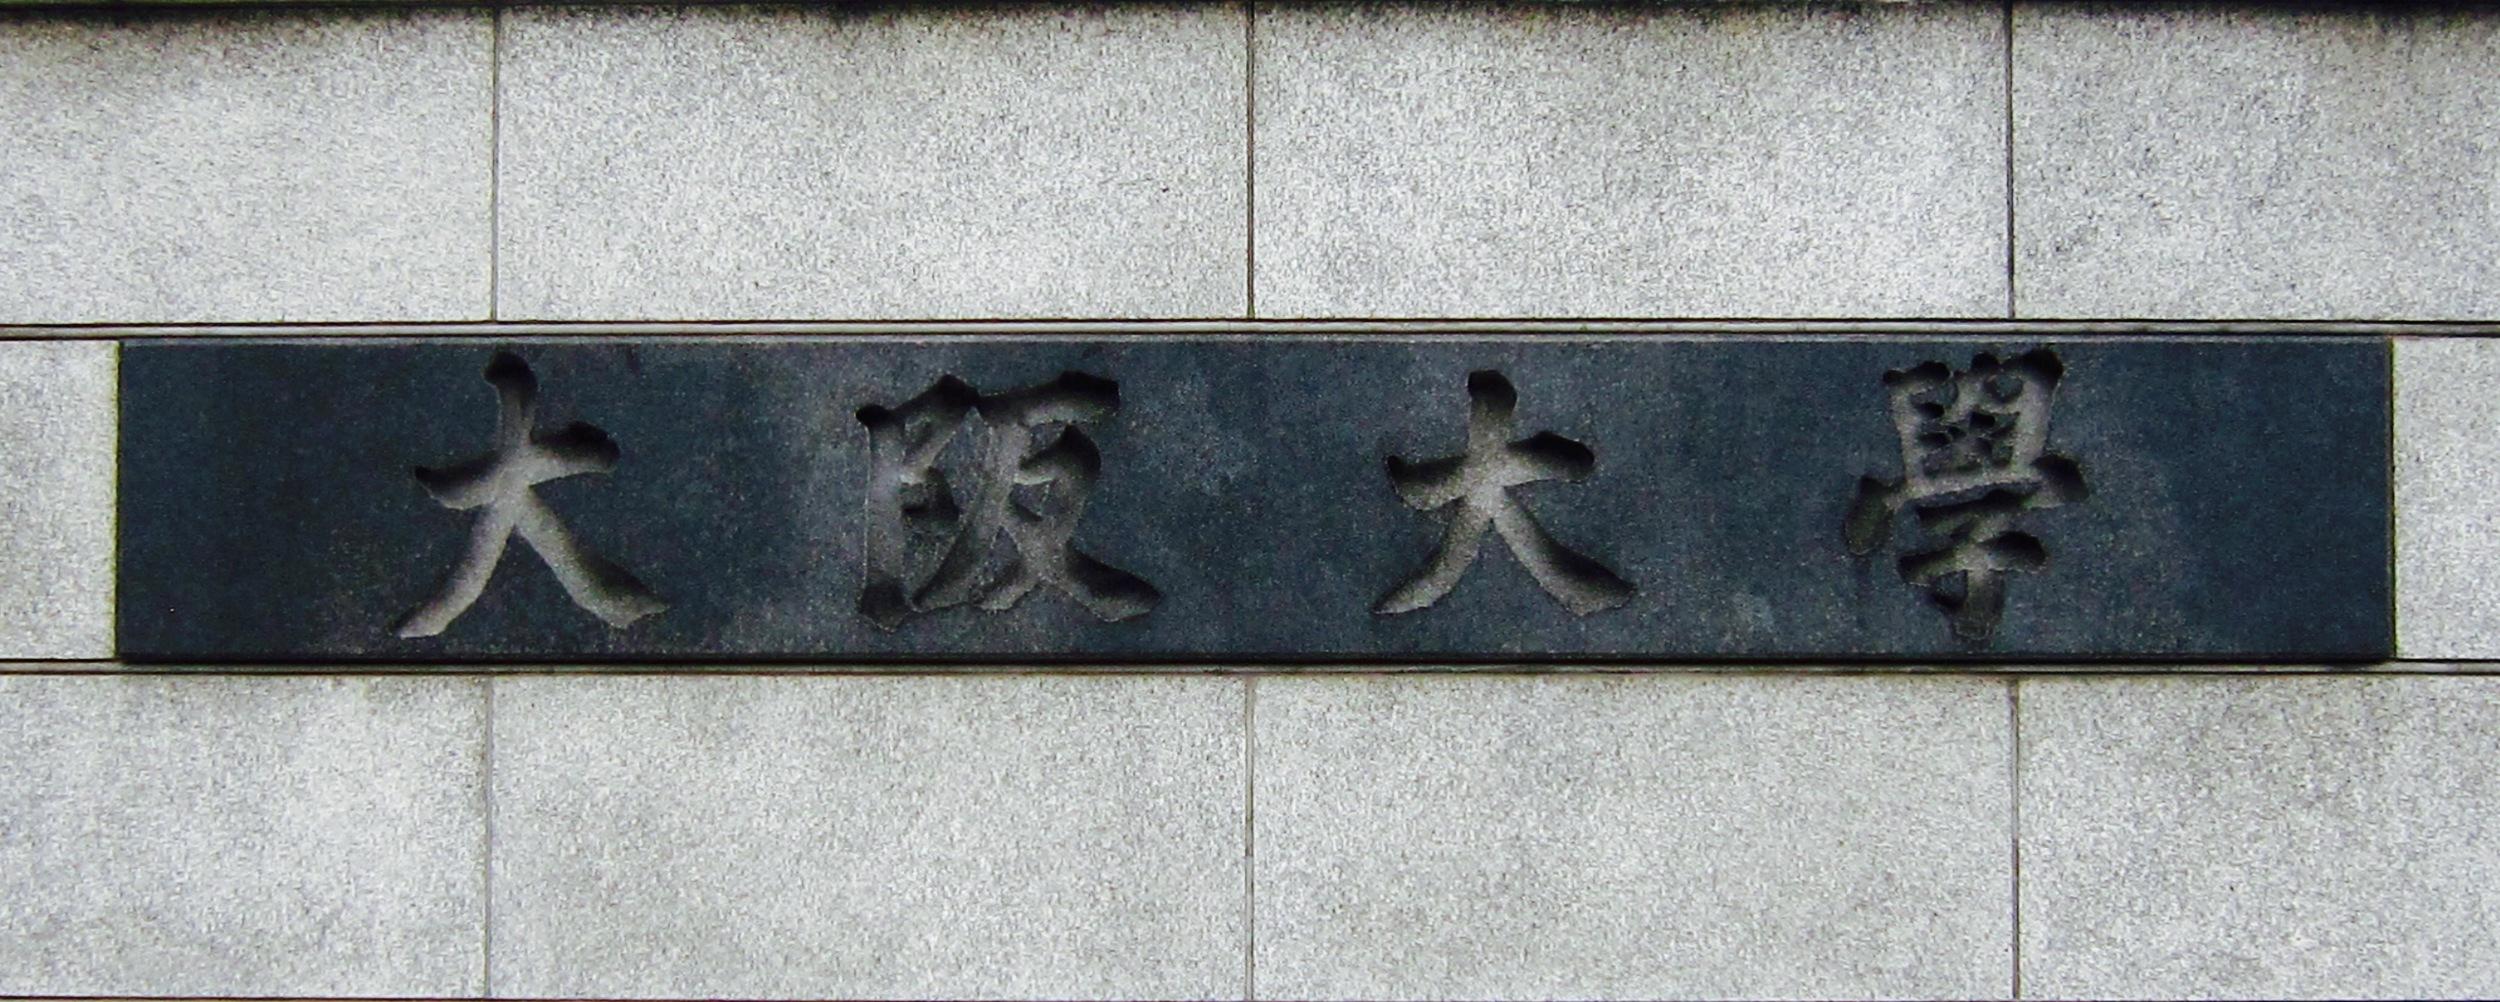 Haupteingang der Ōsaka Universität (Suita Campus)2015 © Wolfgang Schwentker